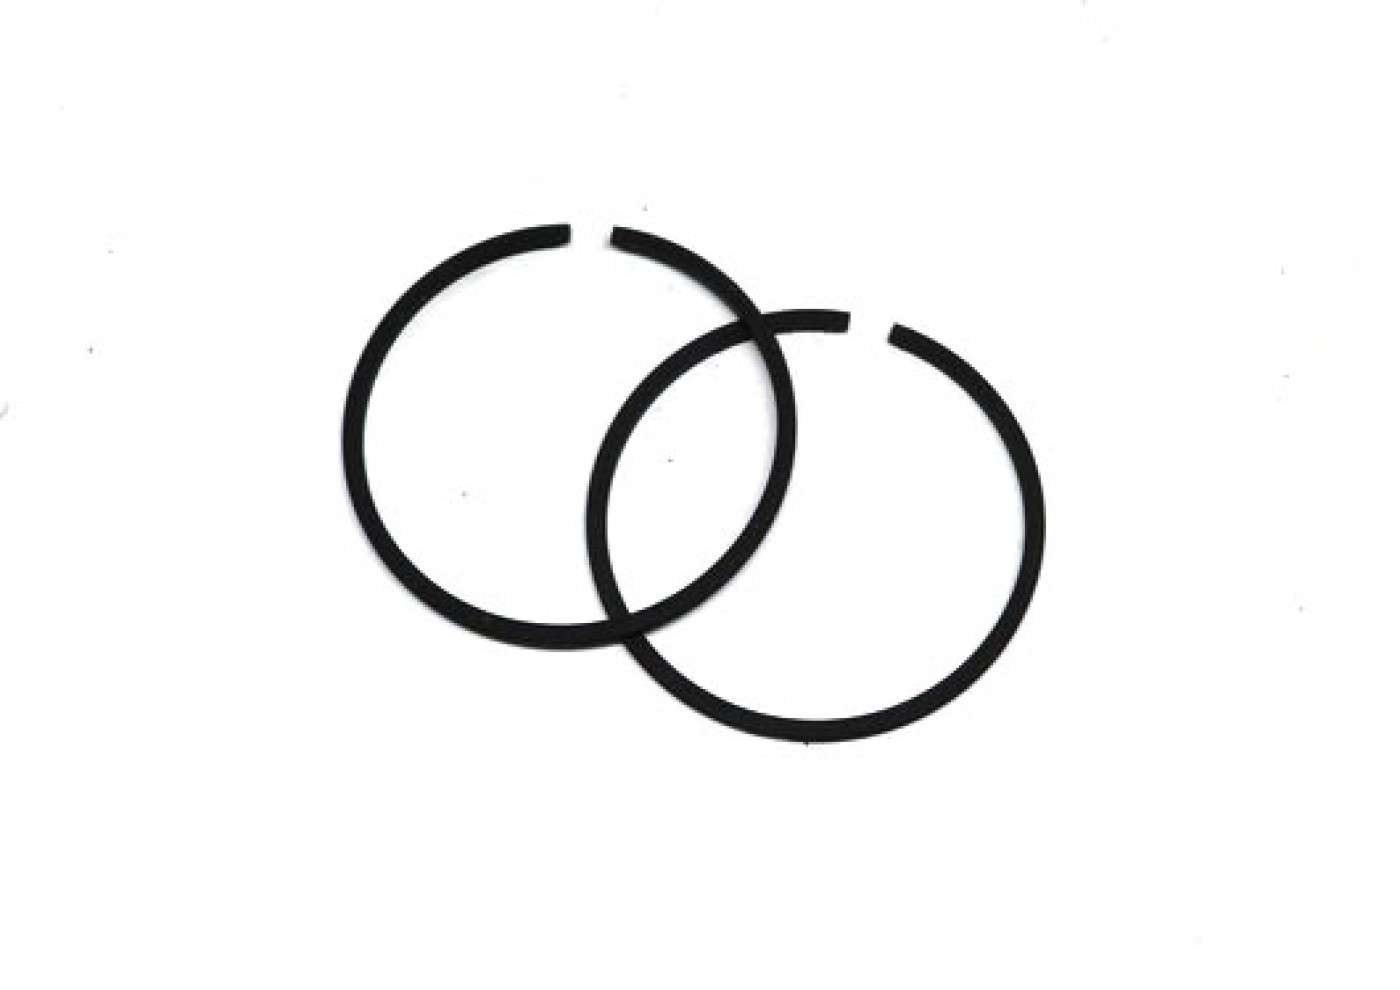 Sada kroužků Partner K950